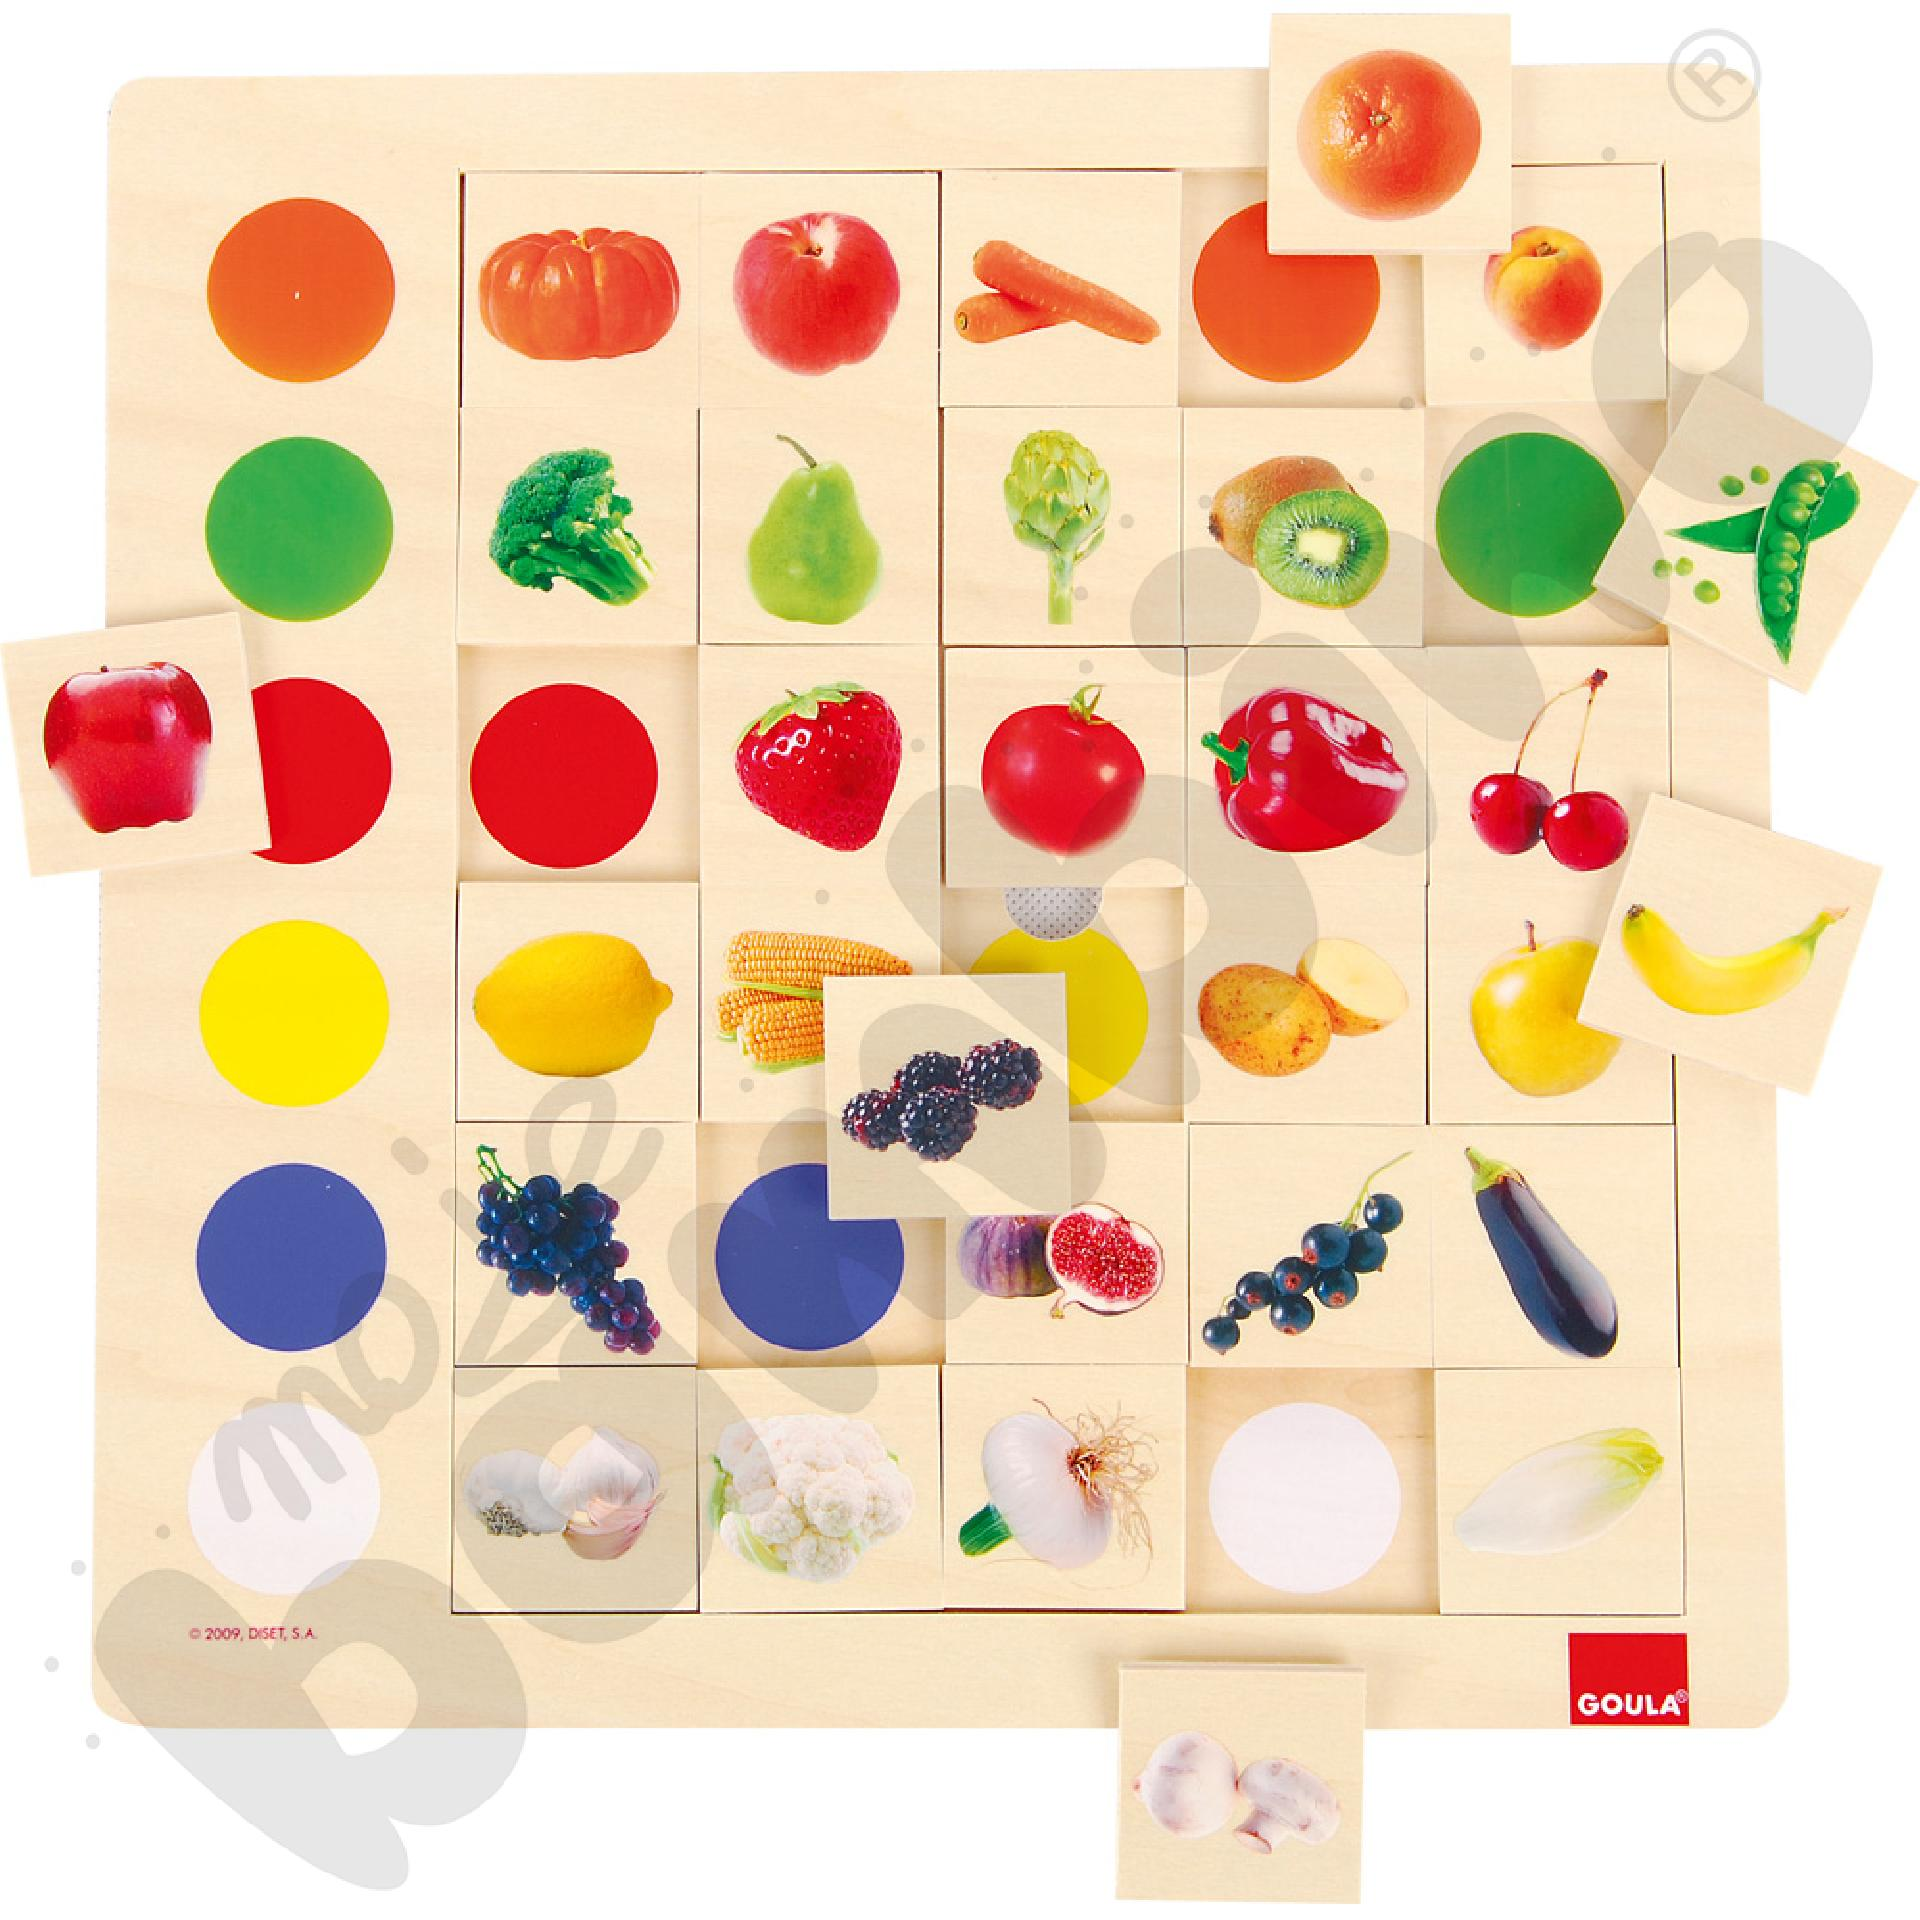 Kolory - owoce i warzywa